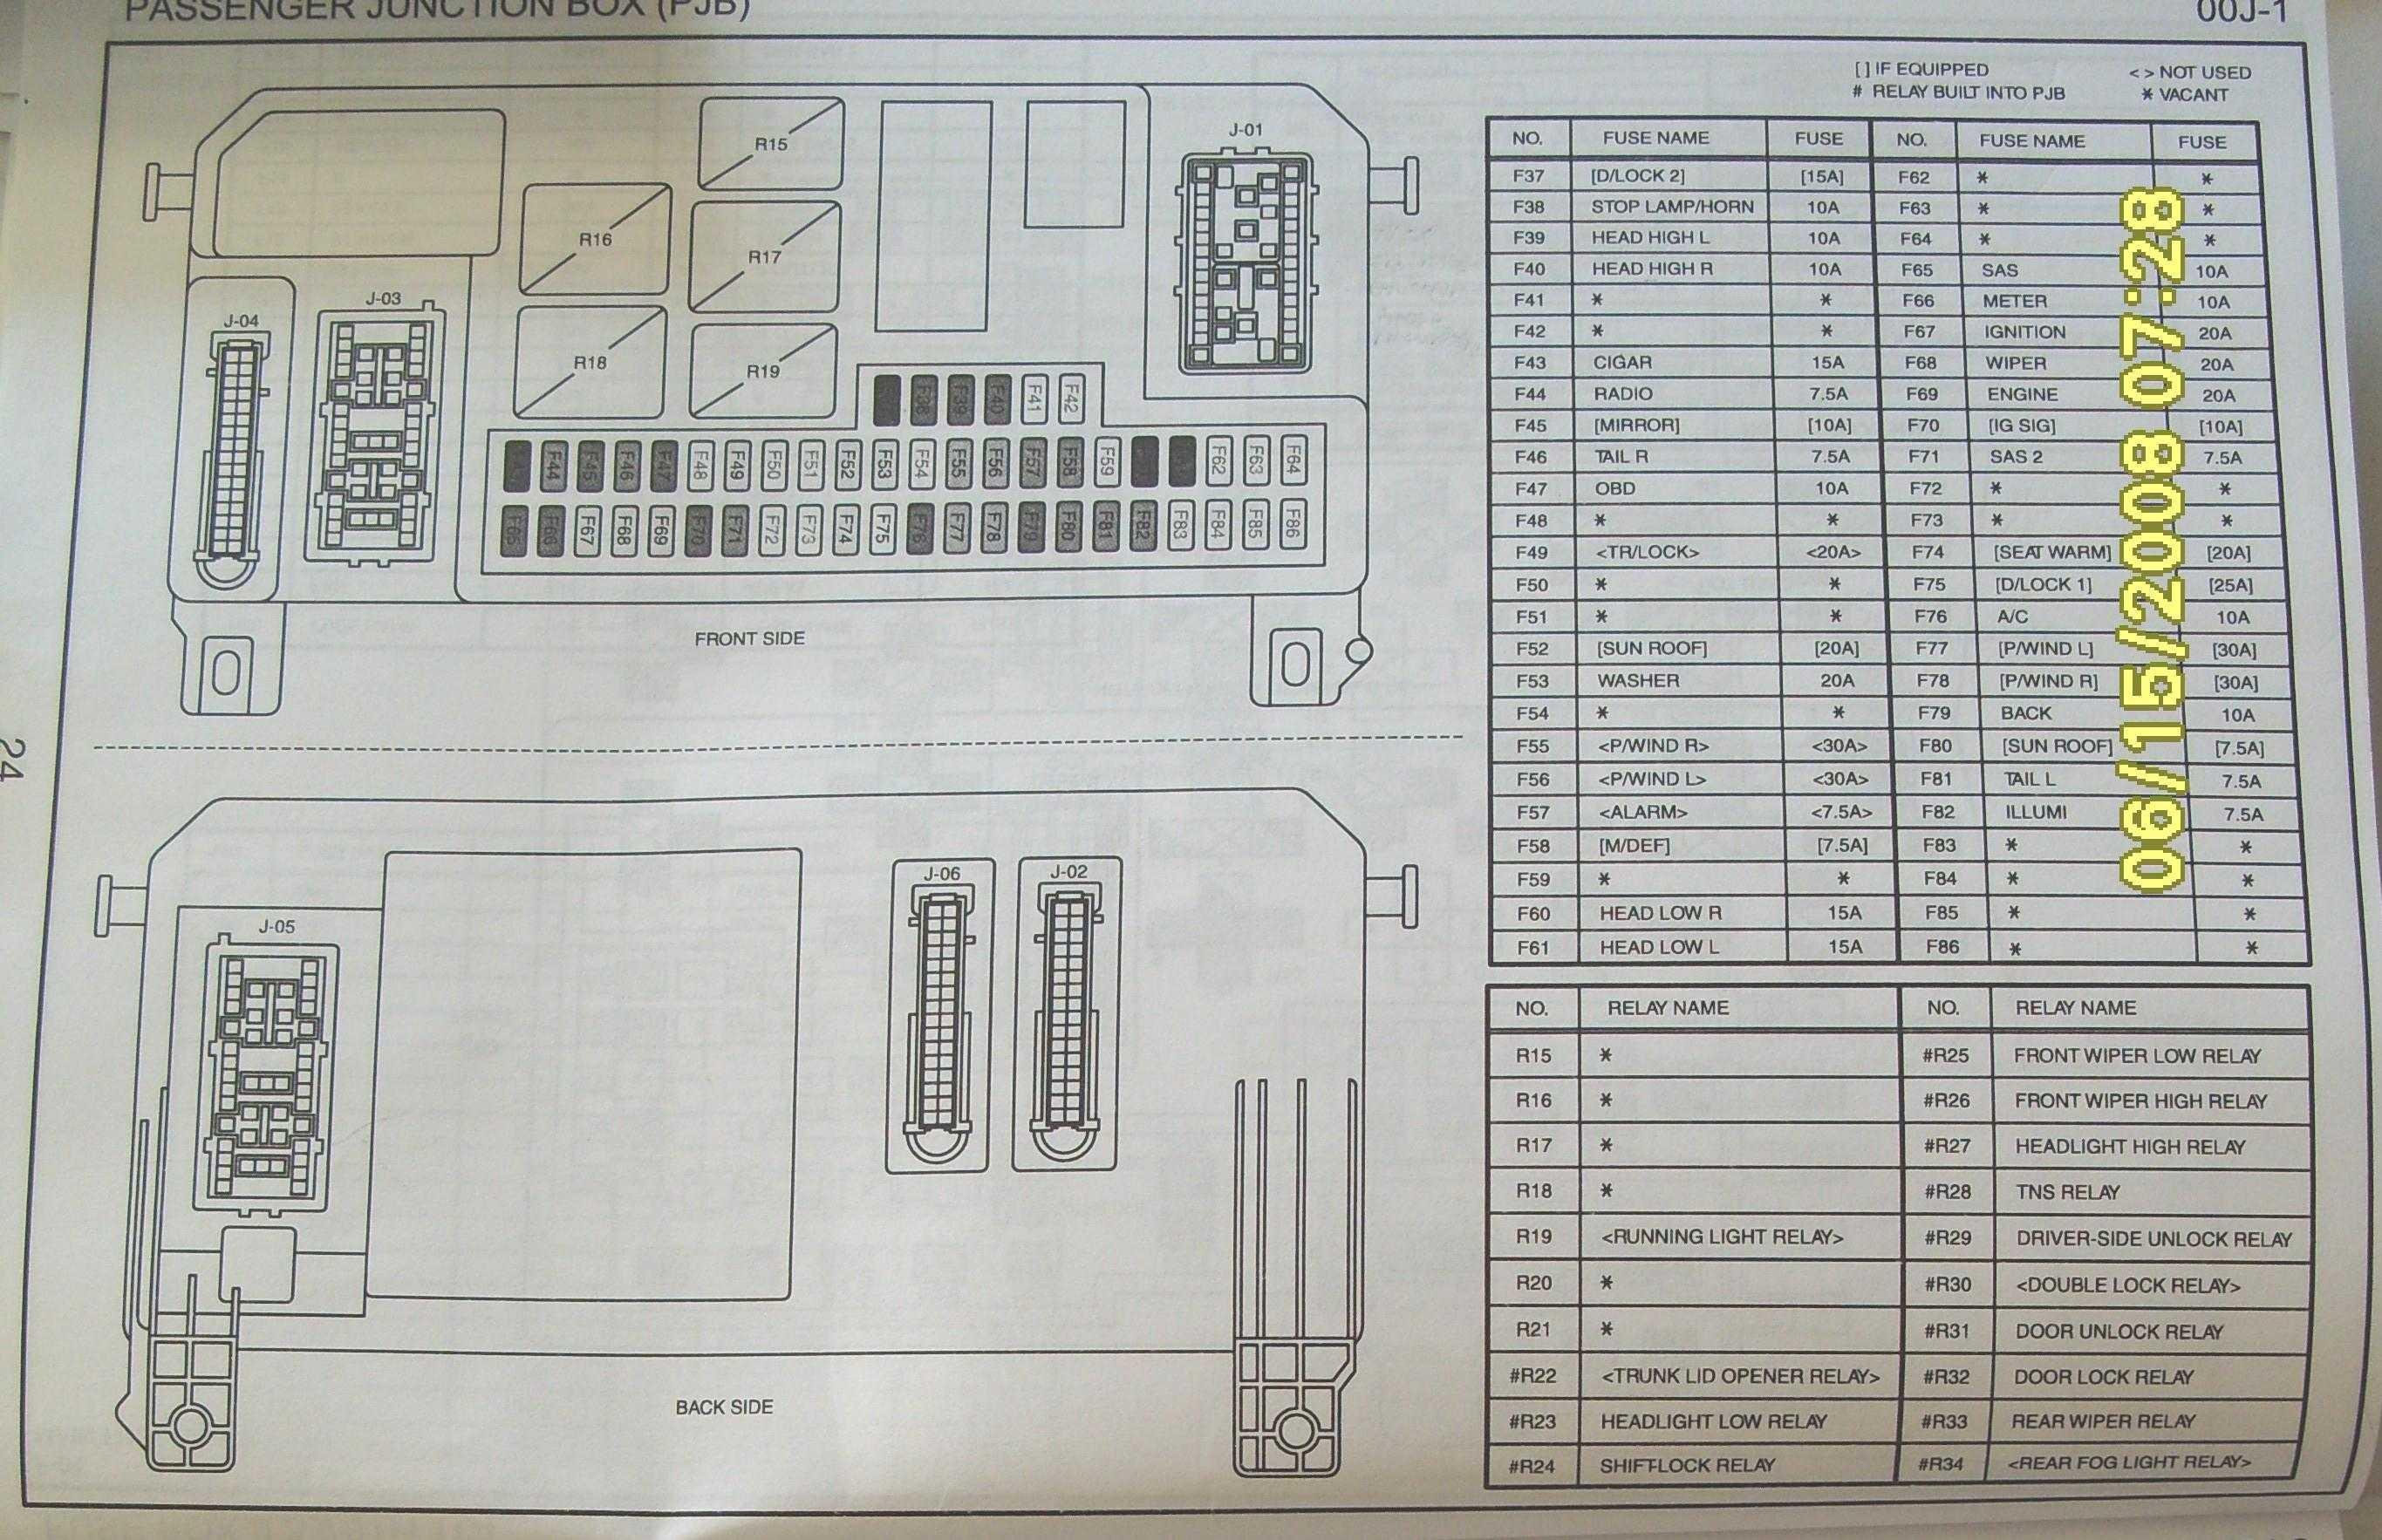 mazda 3 2006 fuse diagram wiring diagrams  2006 mazda 3 fuse box diagram #14